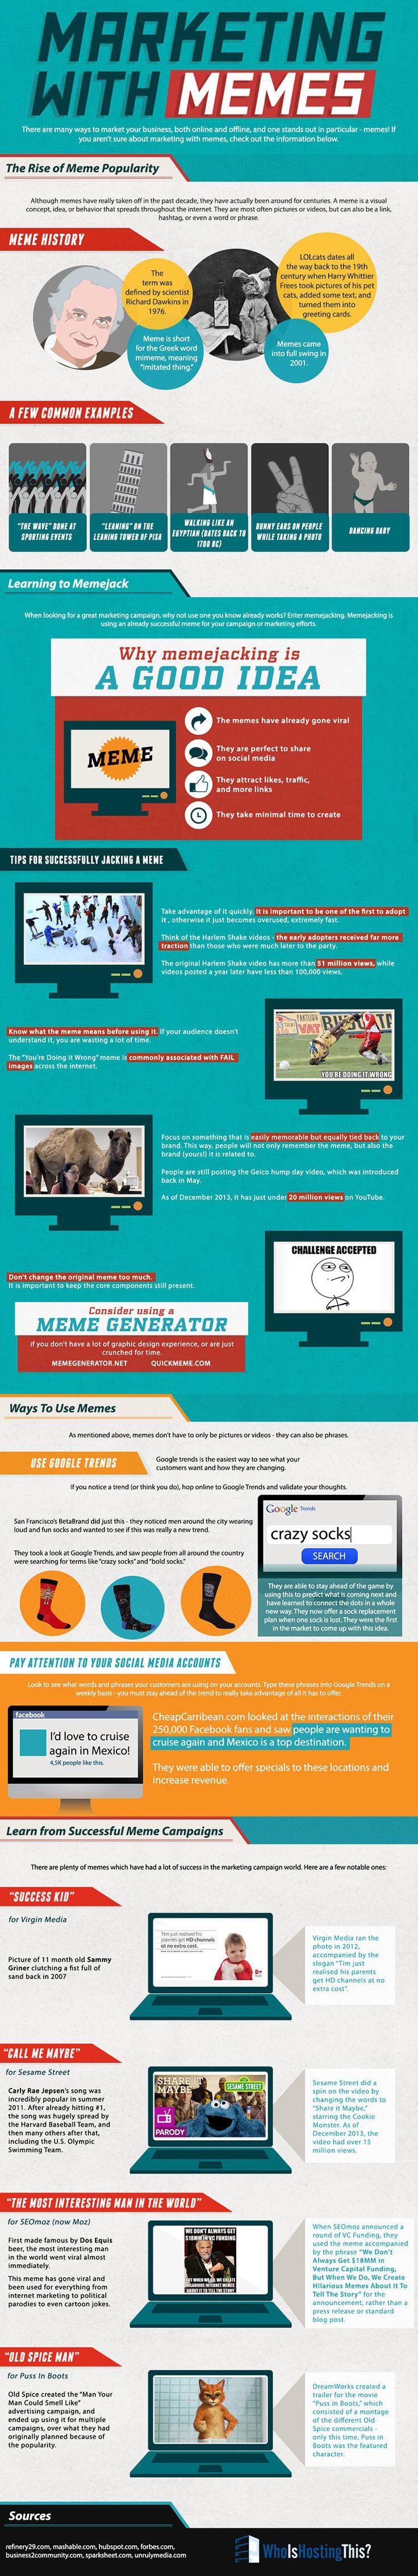 Digital-Marketing-Marketing-with-Memes-Marketing-Business-Meme-infographic Digital Marketing : Marketing with Memes   #Marketing #Business #Meme #infographic